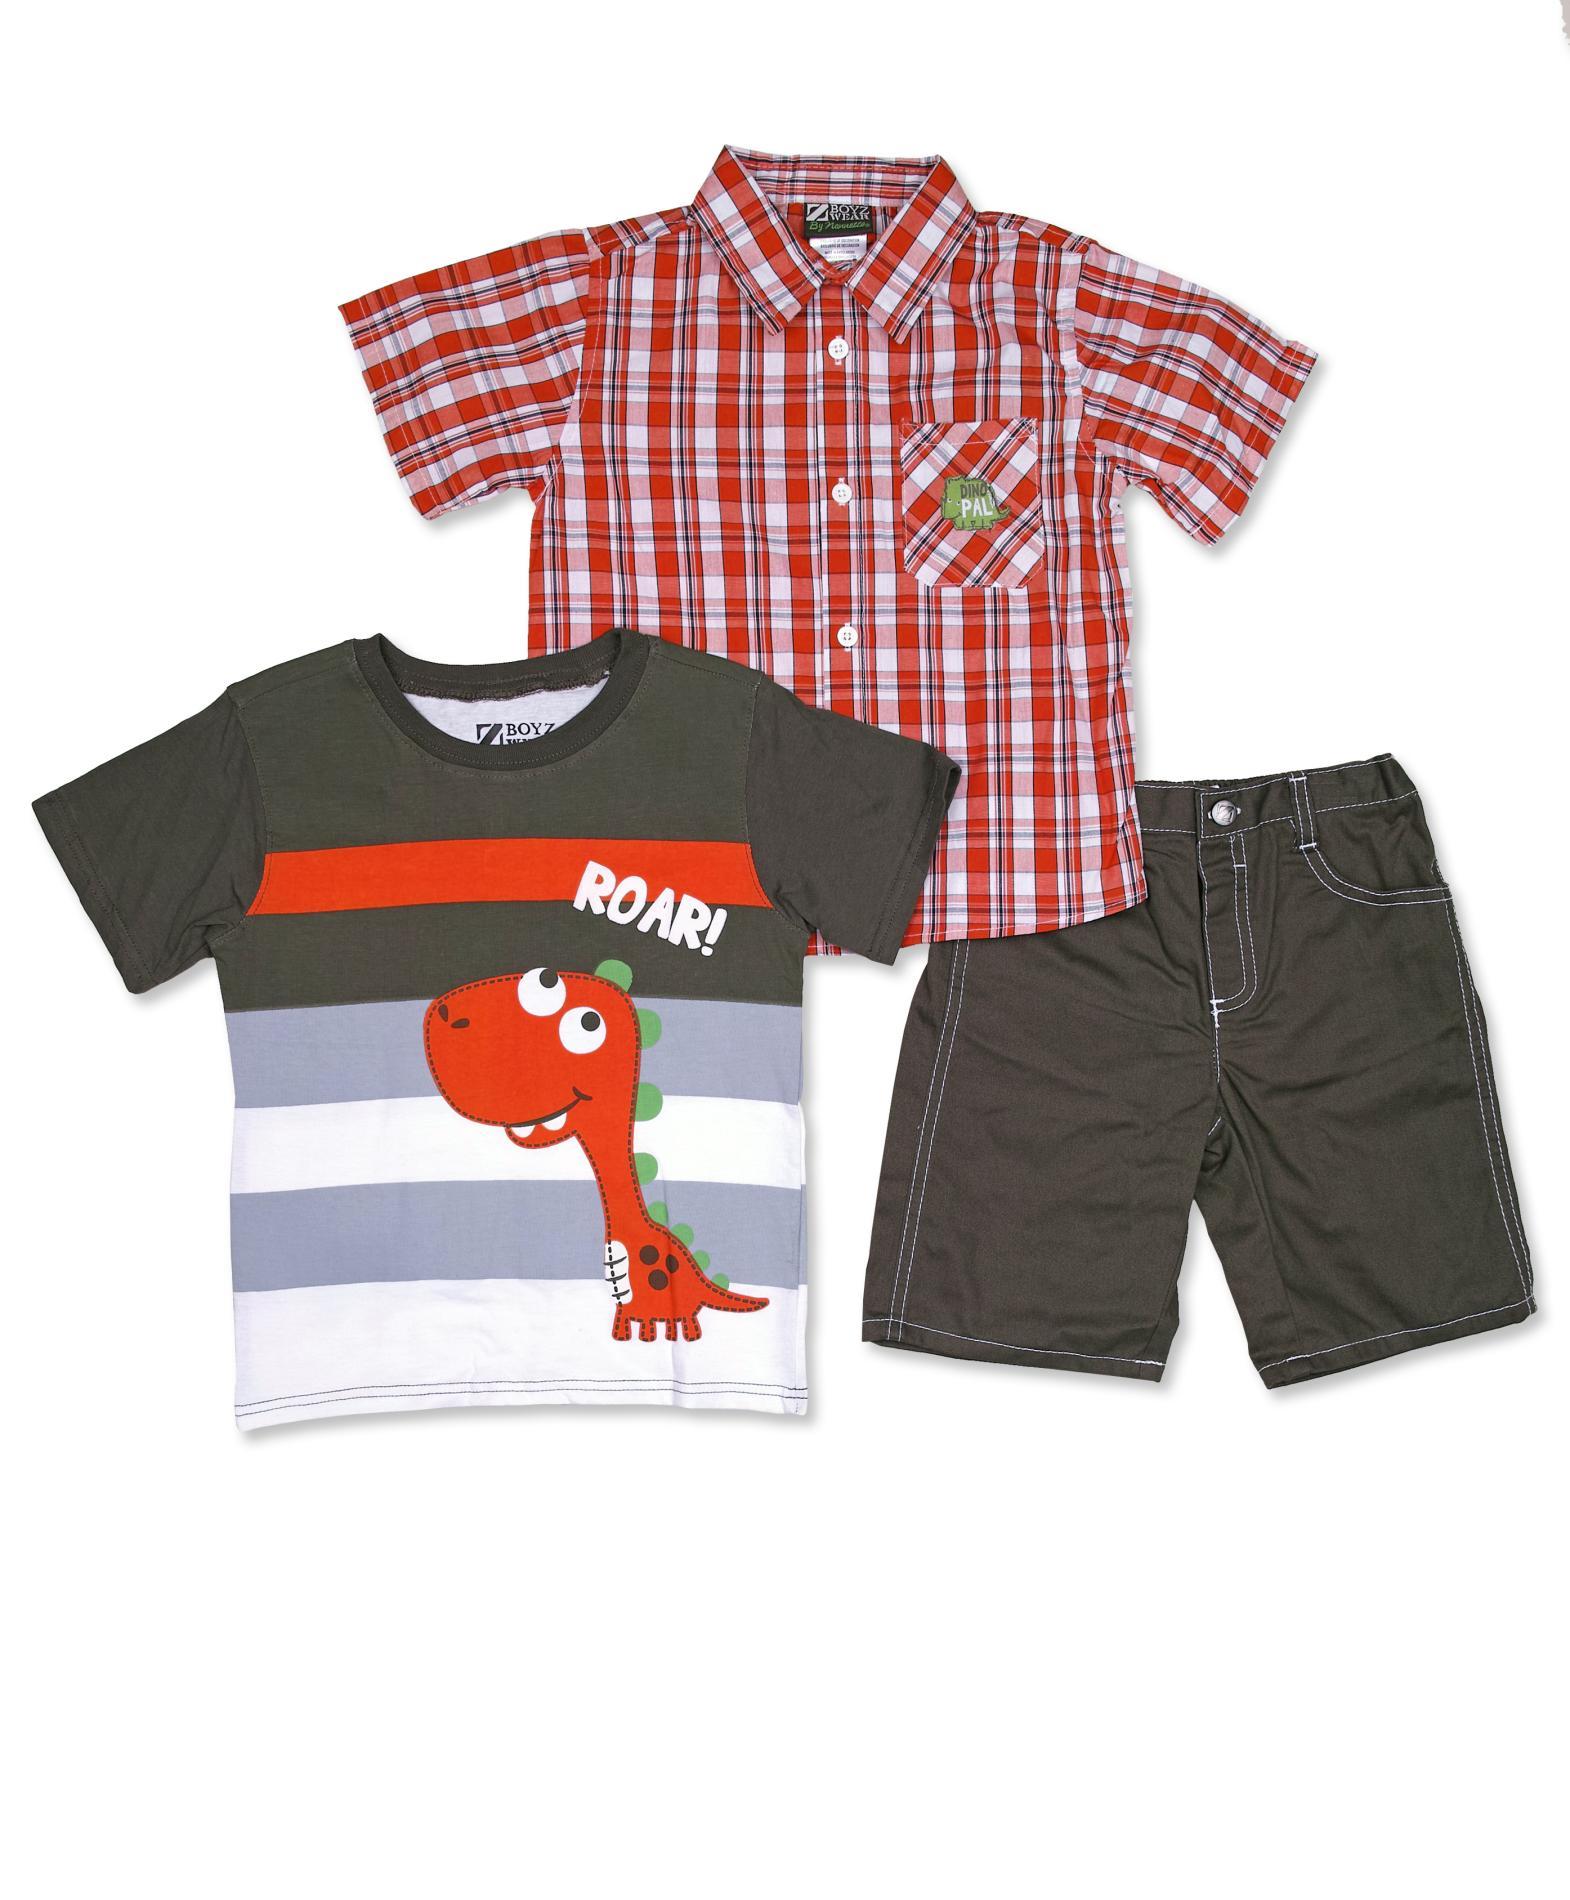 Little Rebels Infant & Toddler Boy's Shirt, T-Shirt & Denim Shorts - Dinosaur Roar